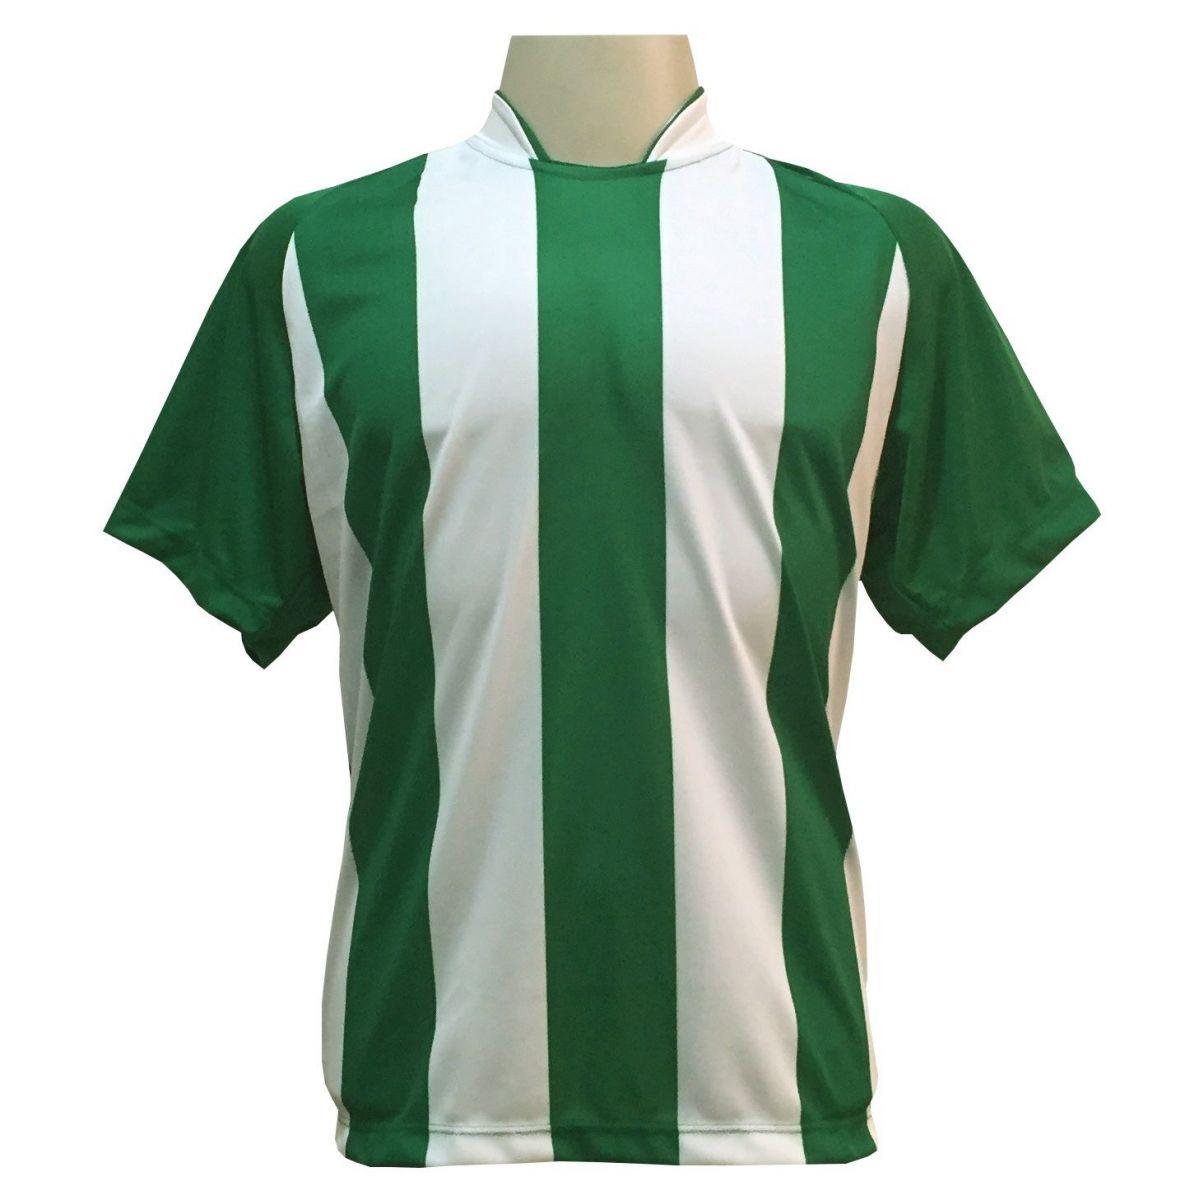 Fardamento Completo modelo Milan 18+1 (18 Camisas Verde/Branco + 18 Calções Verde/Branco + 18 Pares de Meiões Branco + 1 Conjunto de Goleiro) + Brindes